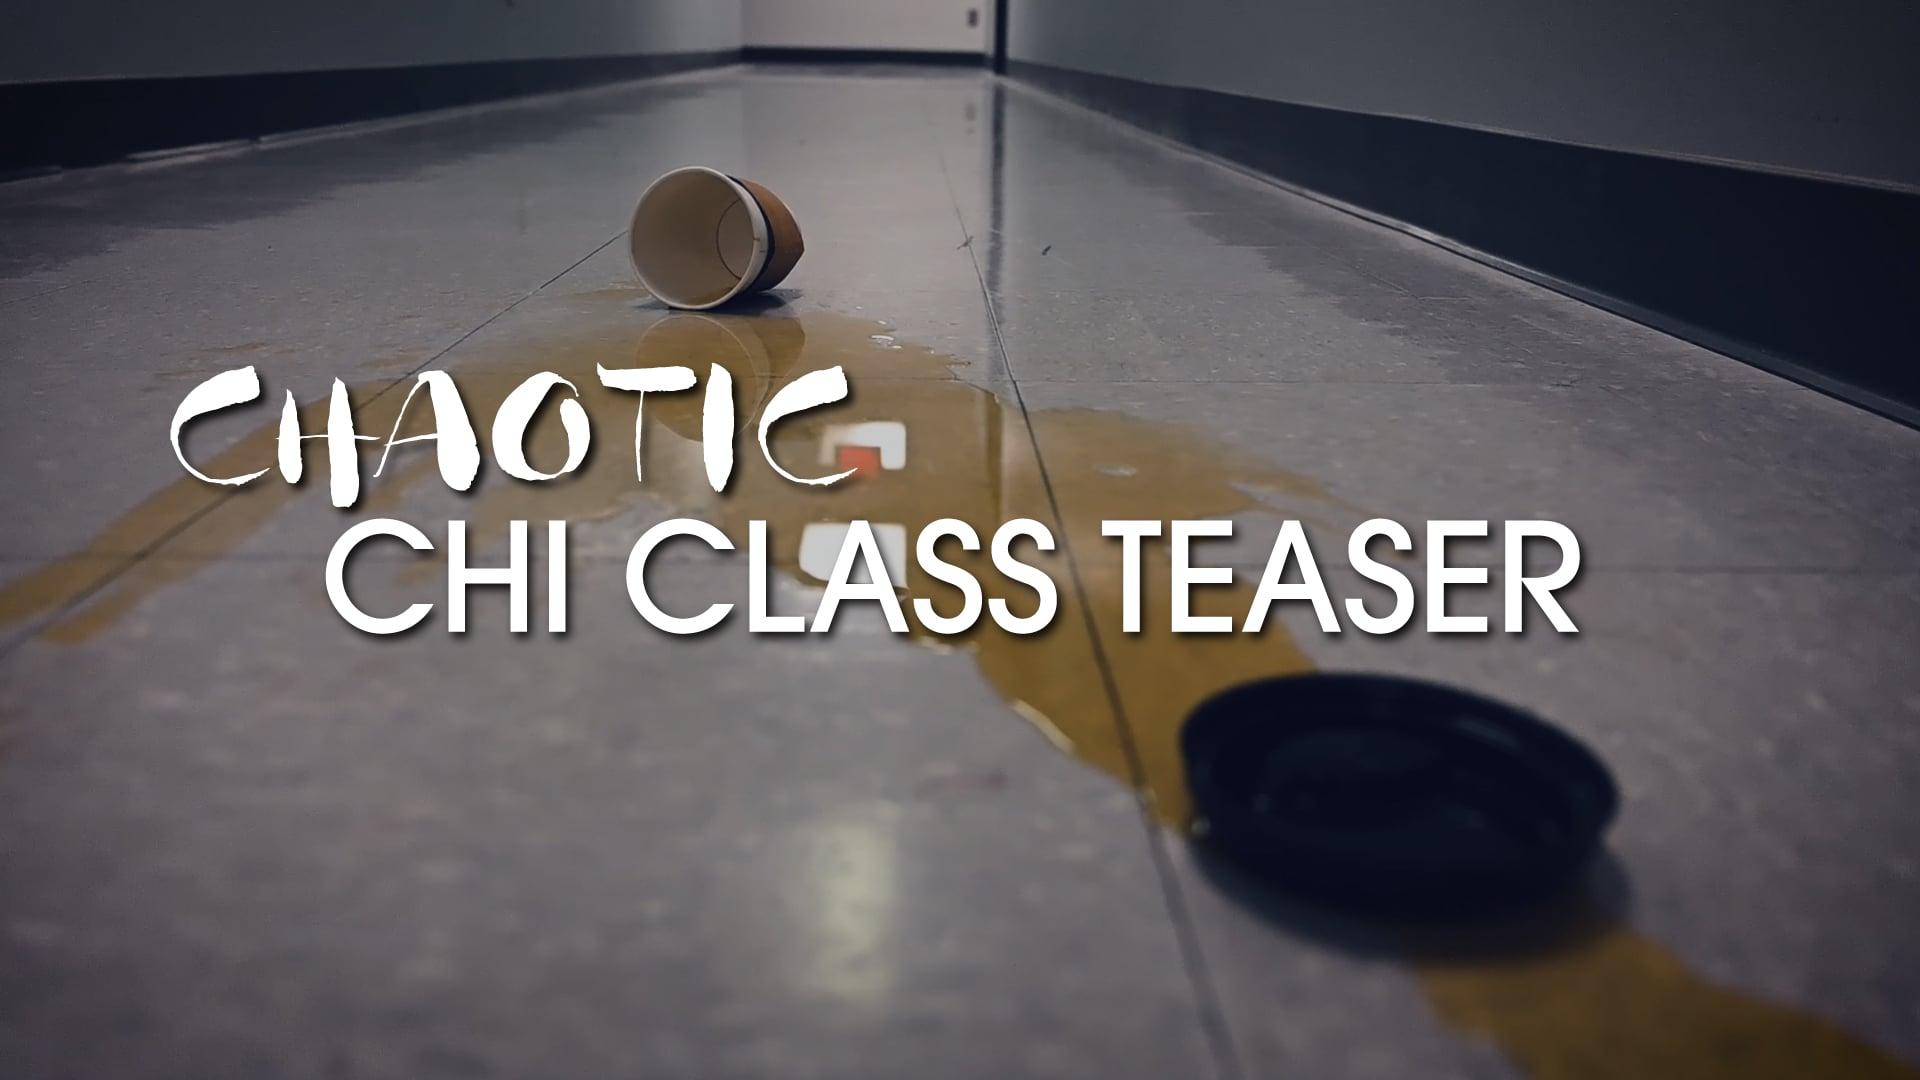 Sigma Psi Zeta - Chi Class Teaser